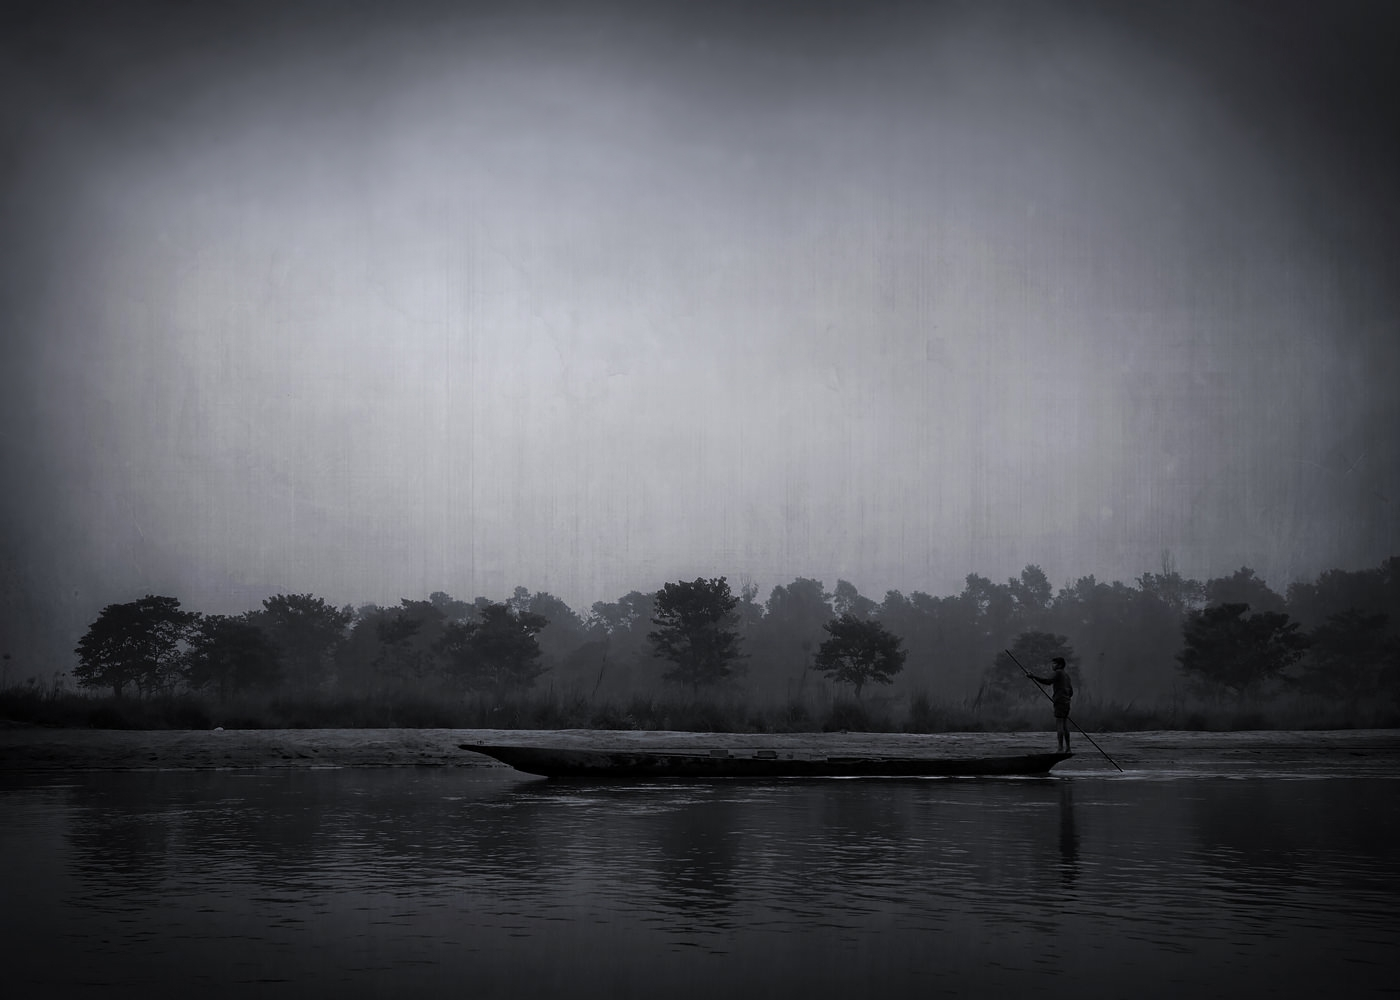 Gondolier Parcul Chitwan rezervatie naturala Nepal alb negru